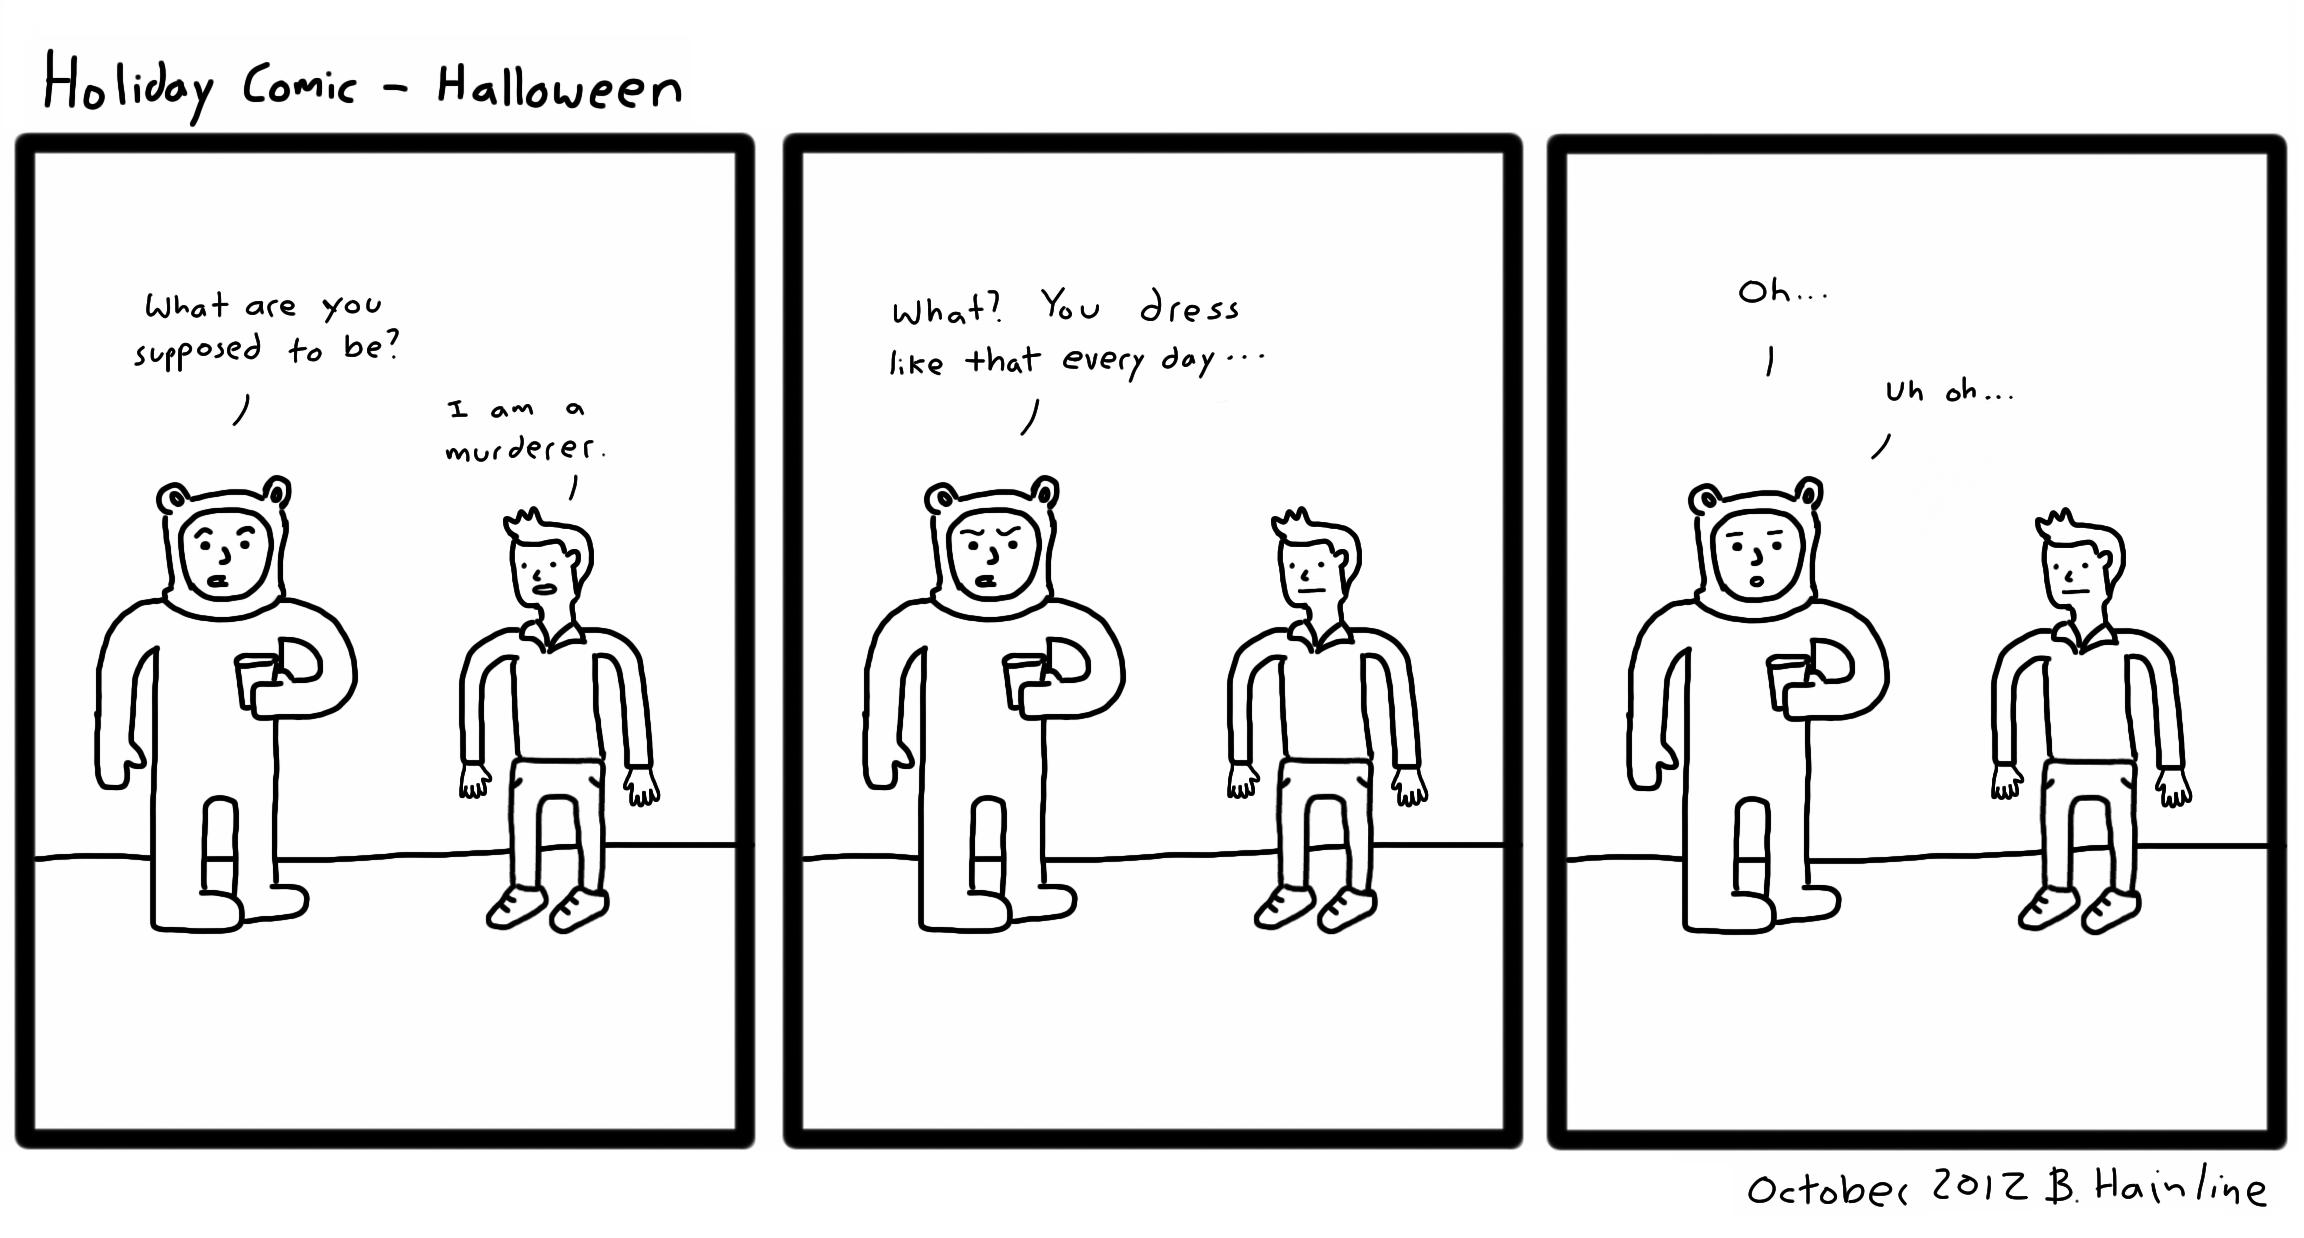 Holiday Comic - Halloween